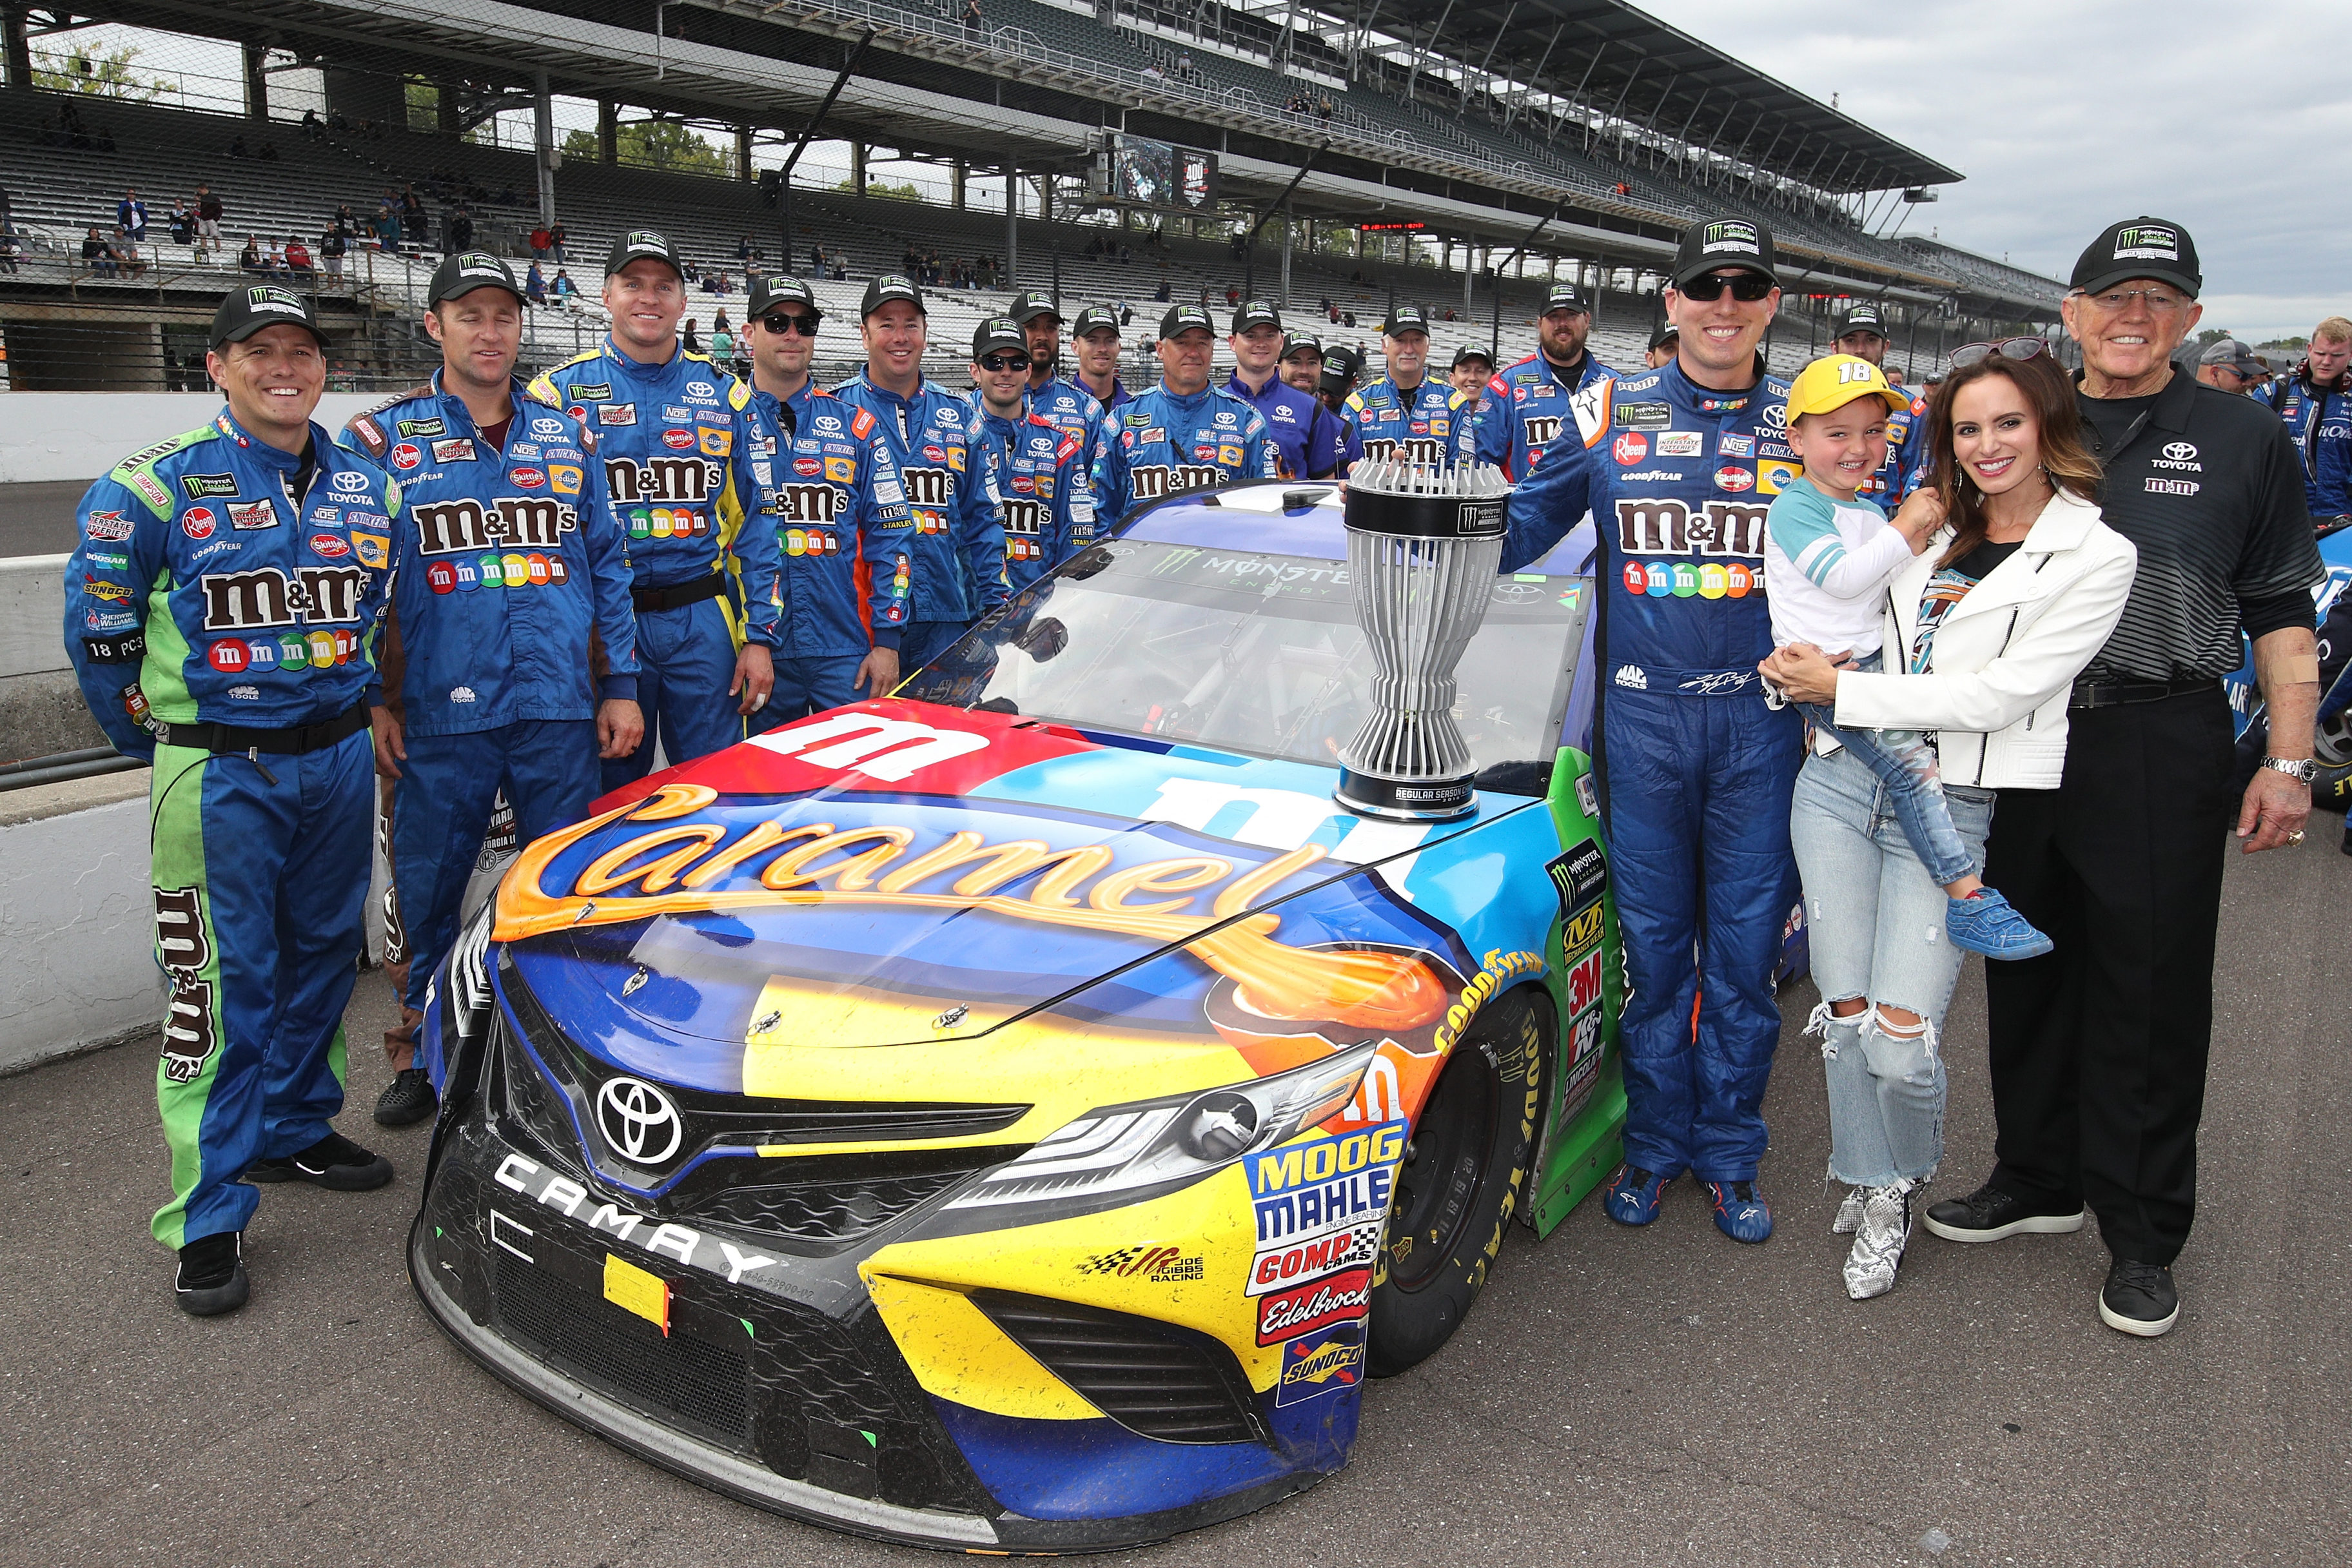 Kurt Busch - 2018 NASCAR Cup Series Regular Season Champion